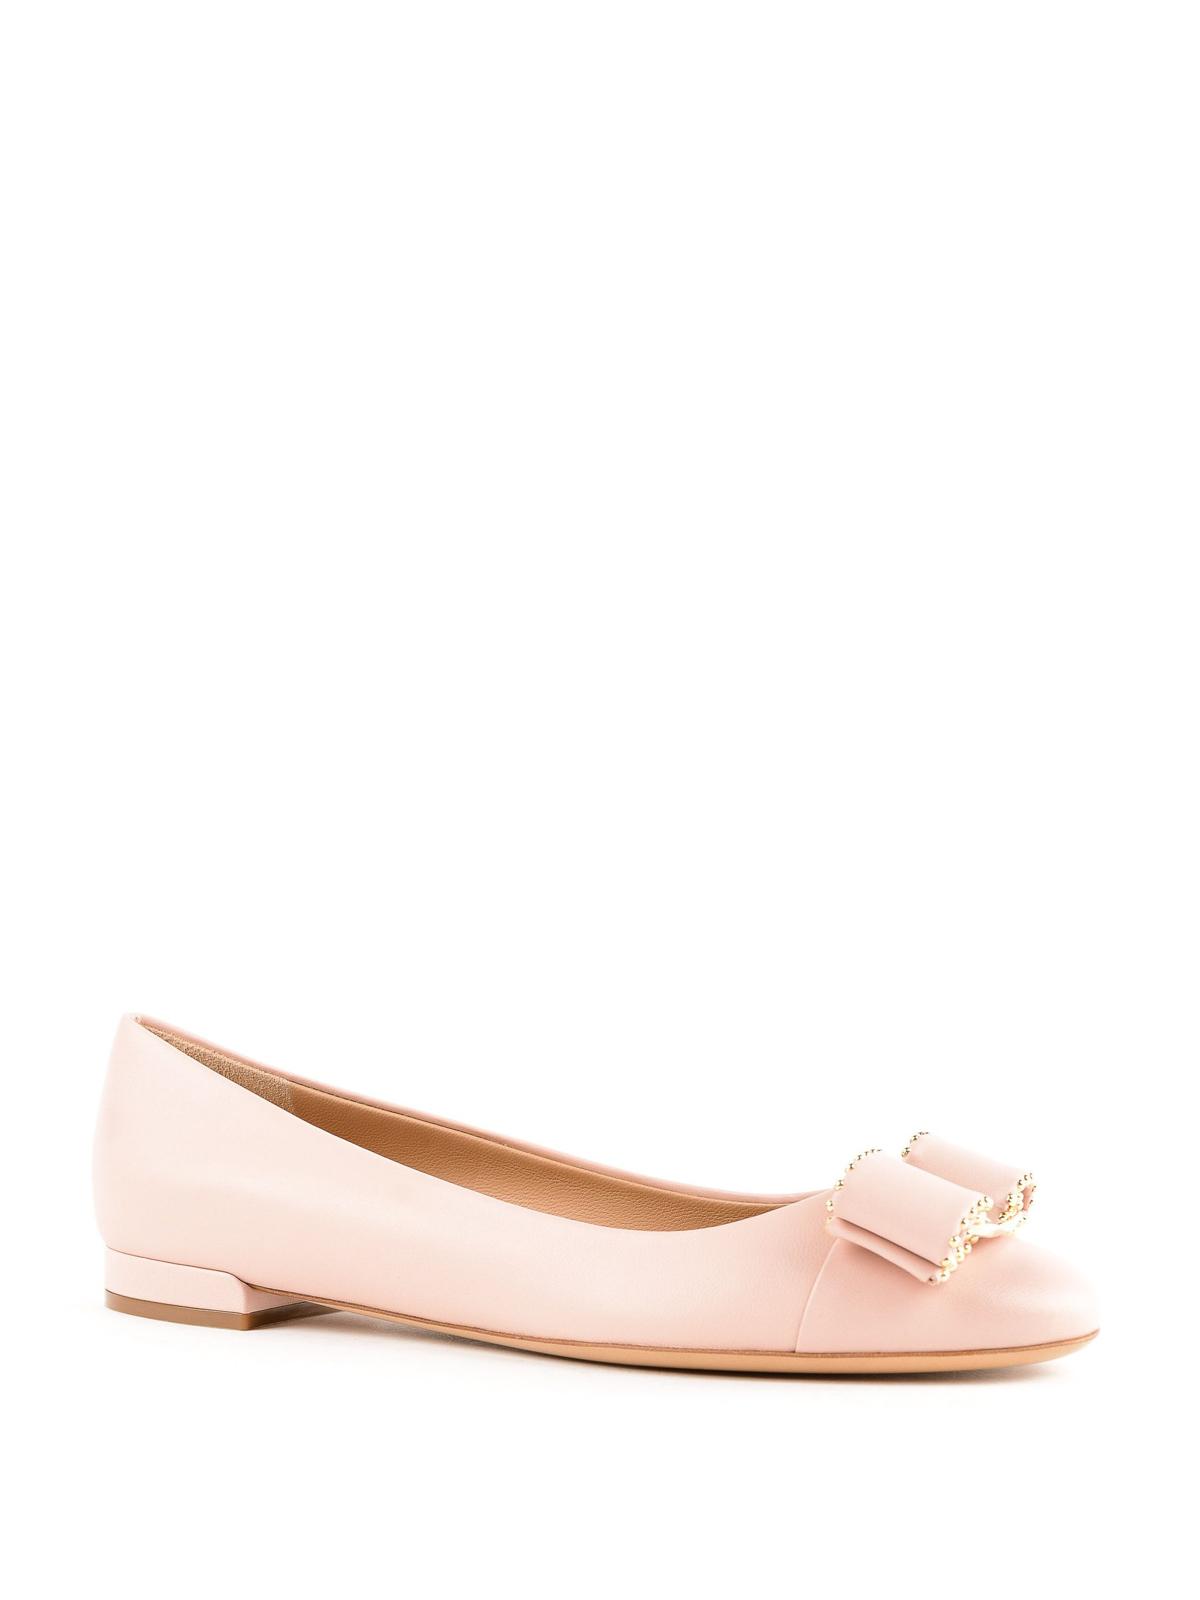 287c02ed5e916 SALVATORE FERRAGAMO: flat shoes online - Varina studded light pink  ballerinas